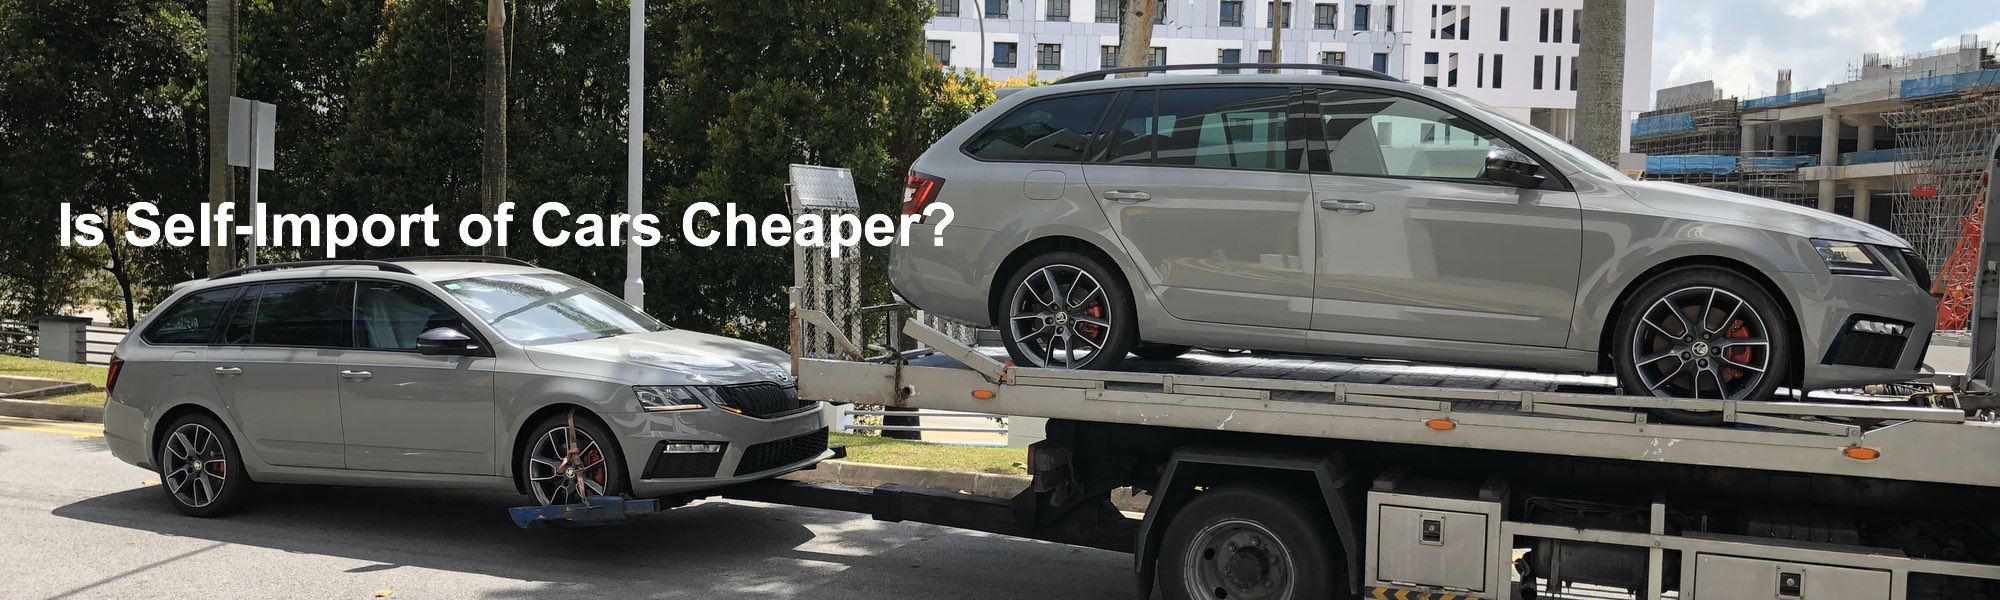 Self import cars cheaper?